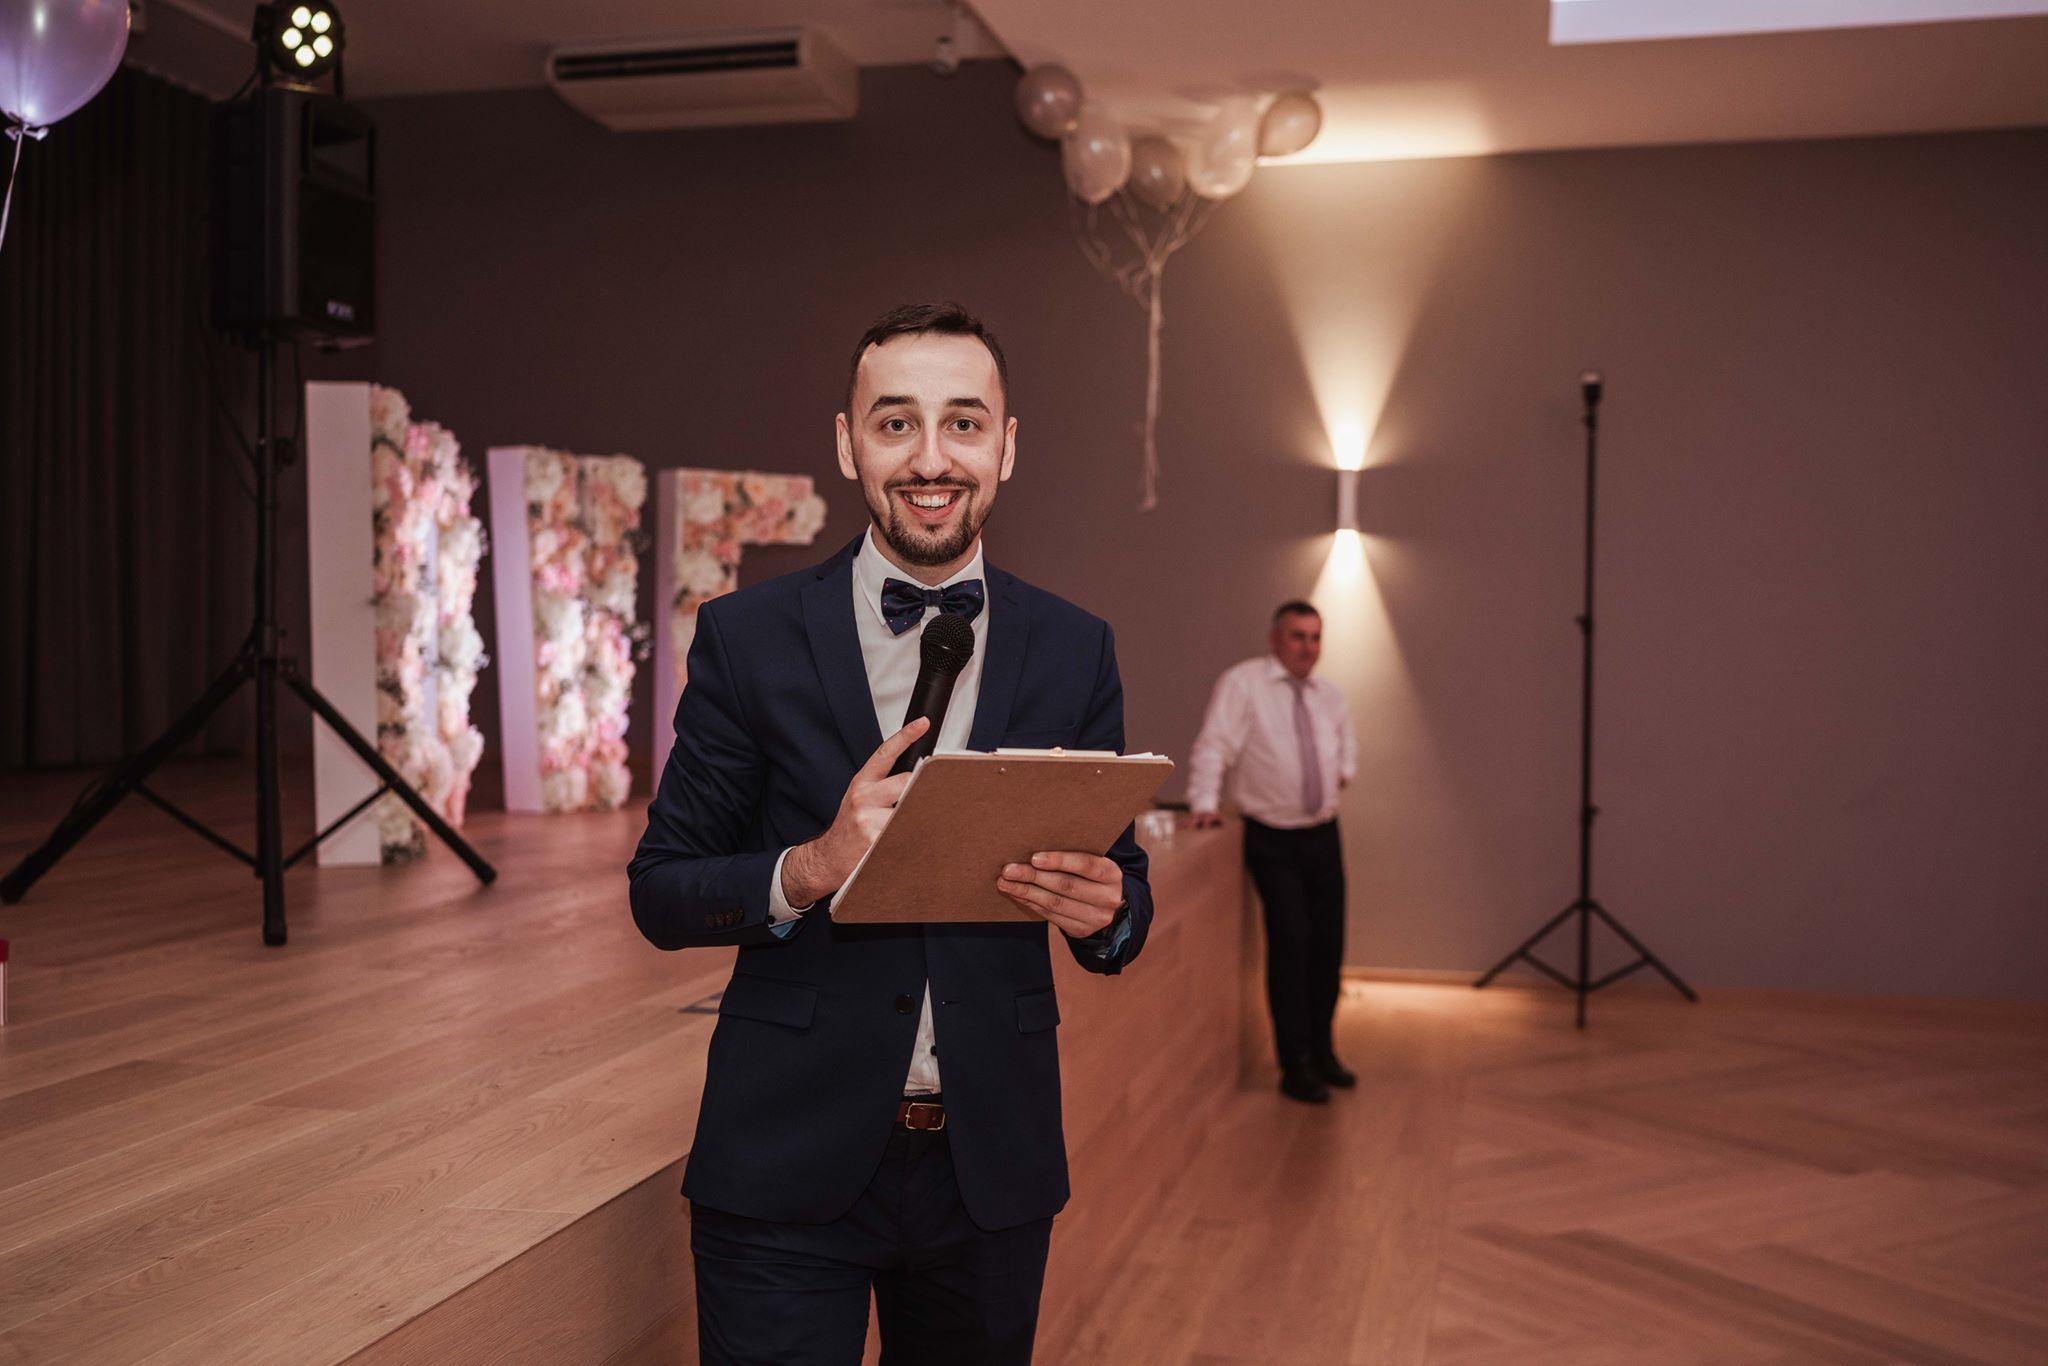 svadba-dj-moderator-starejsi-wedding-slovakiajpg